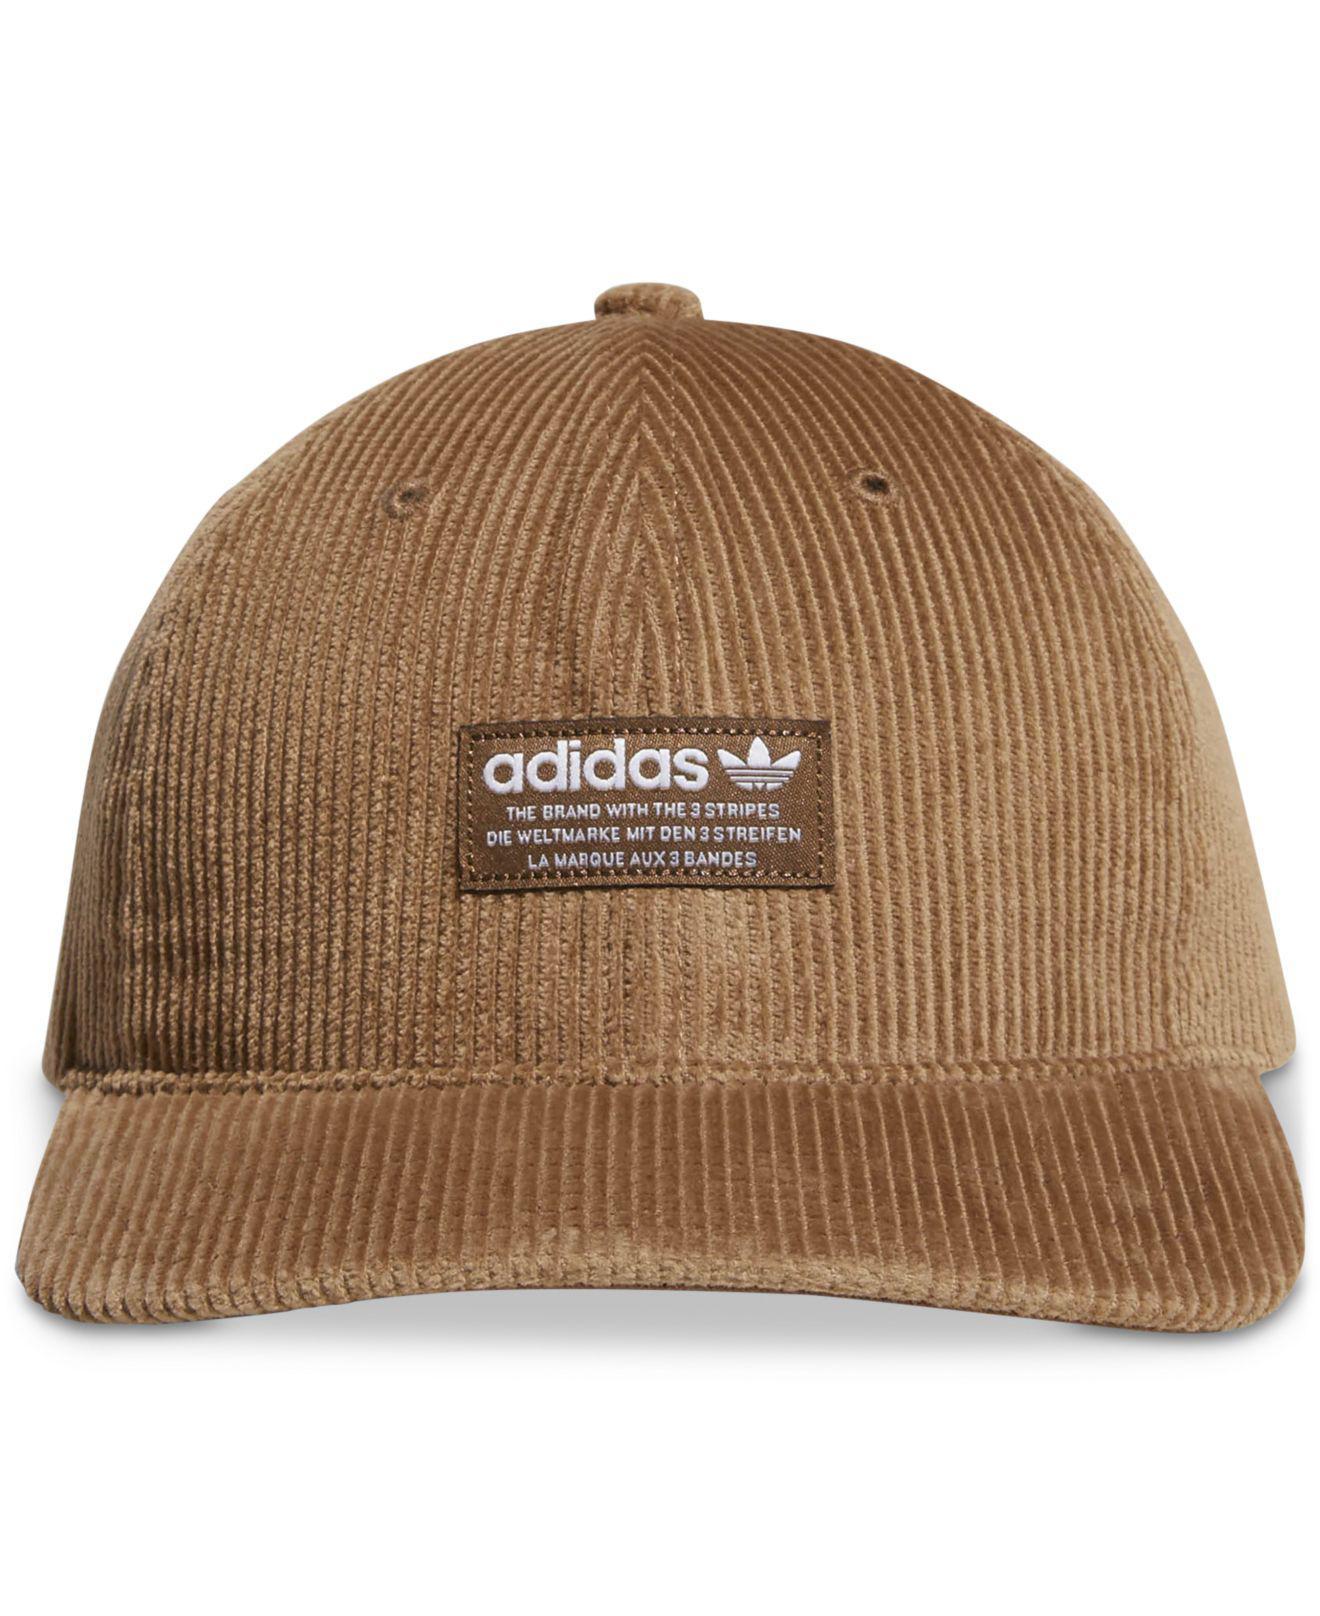 Adidas Originals Corduroy Logo Hat in Brown for Men - Lyst 7d608d97162